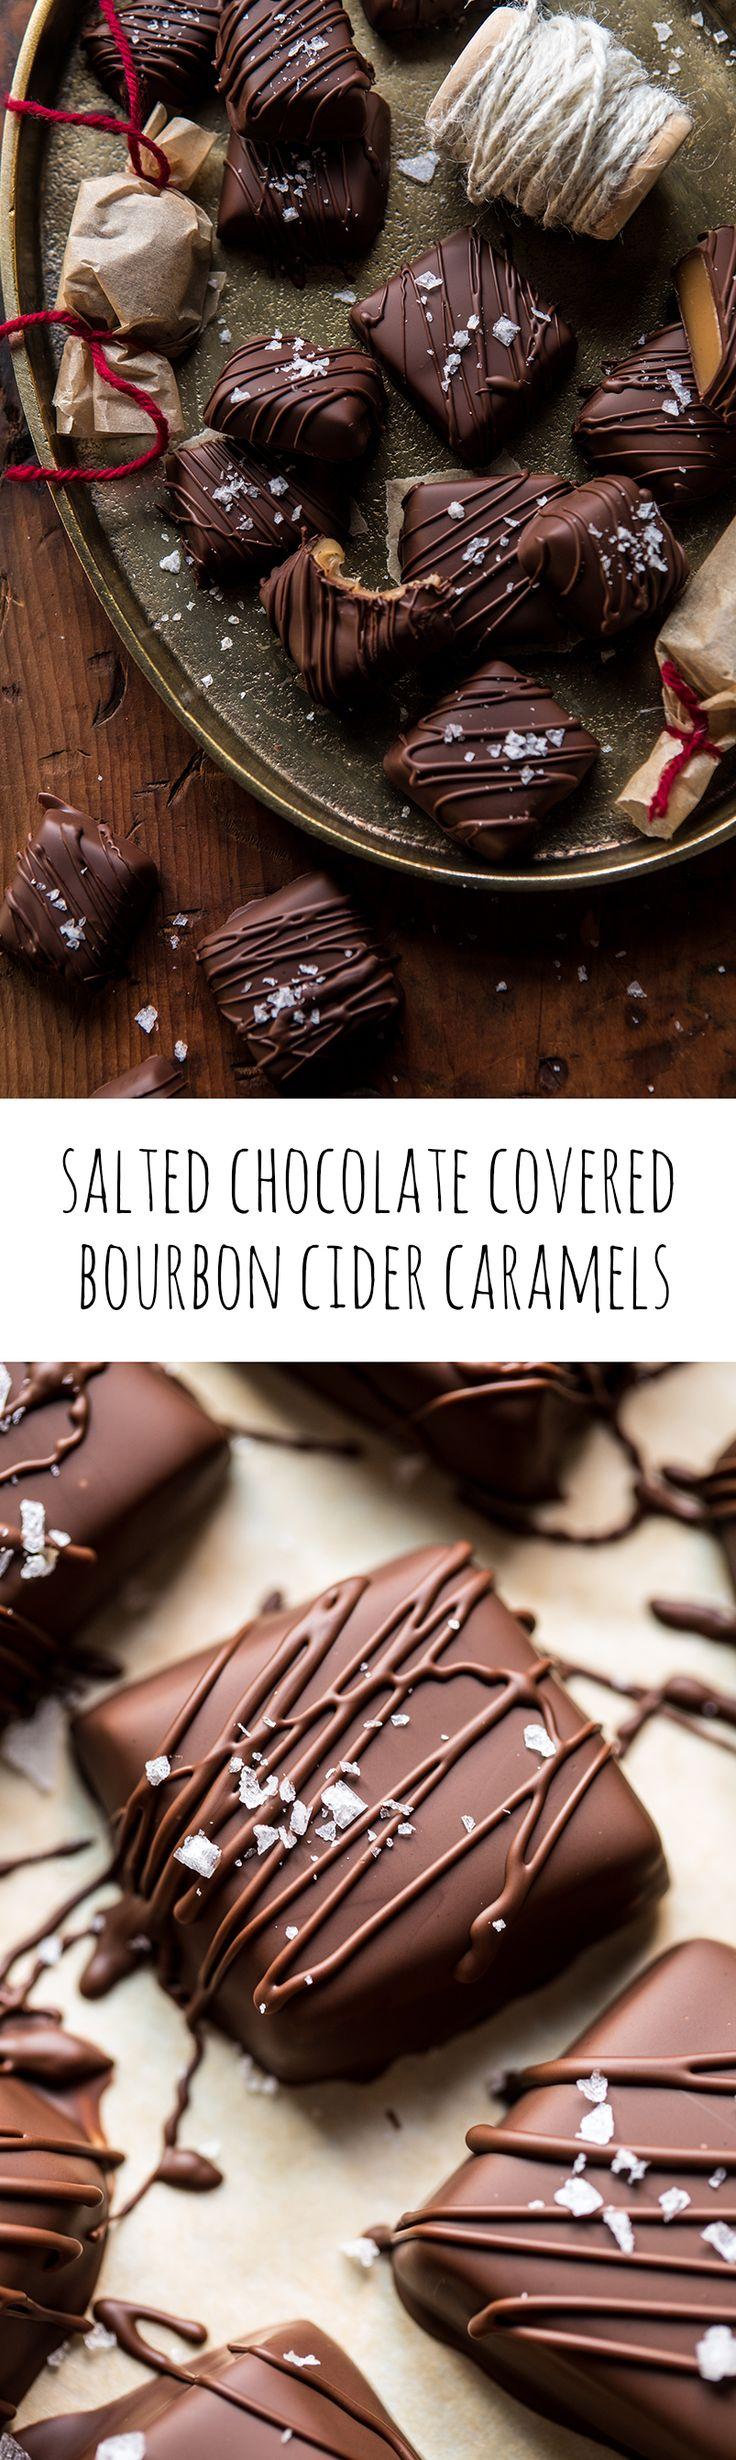 Salted Chocolate Covered Bourbon Cider Caramels | halfbakedharvest.com @hbharvest